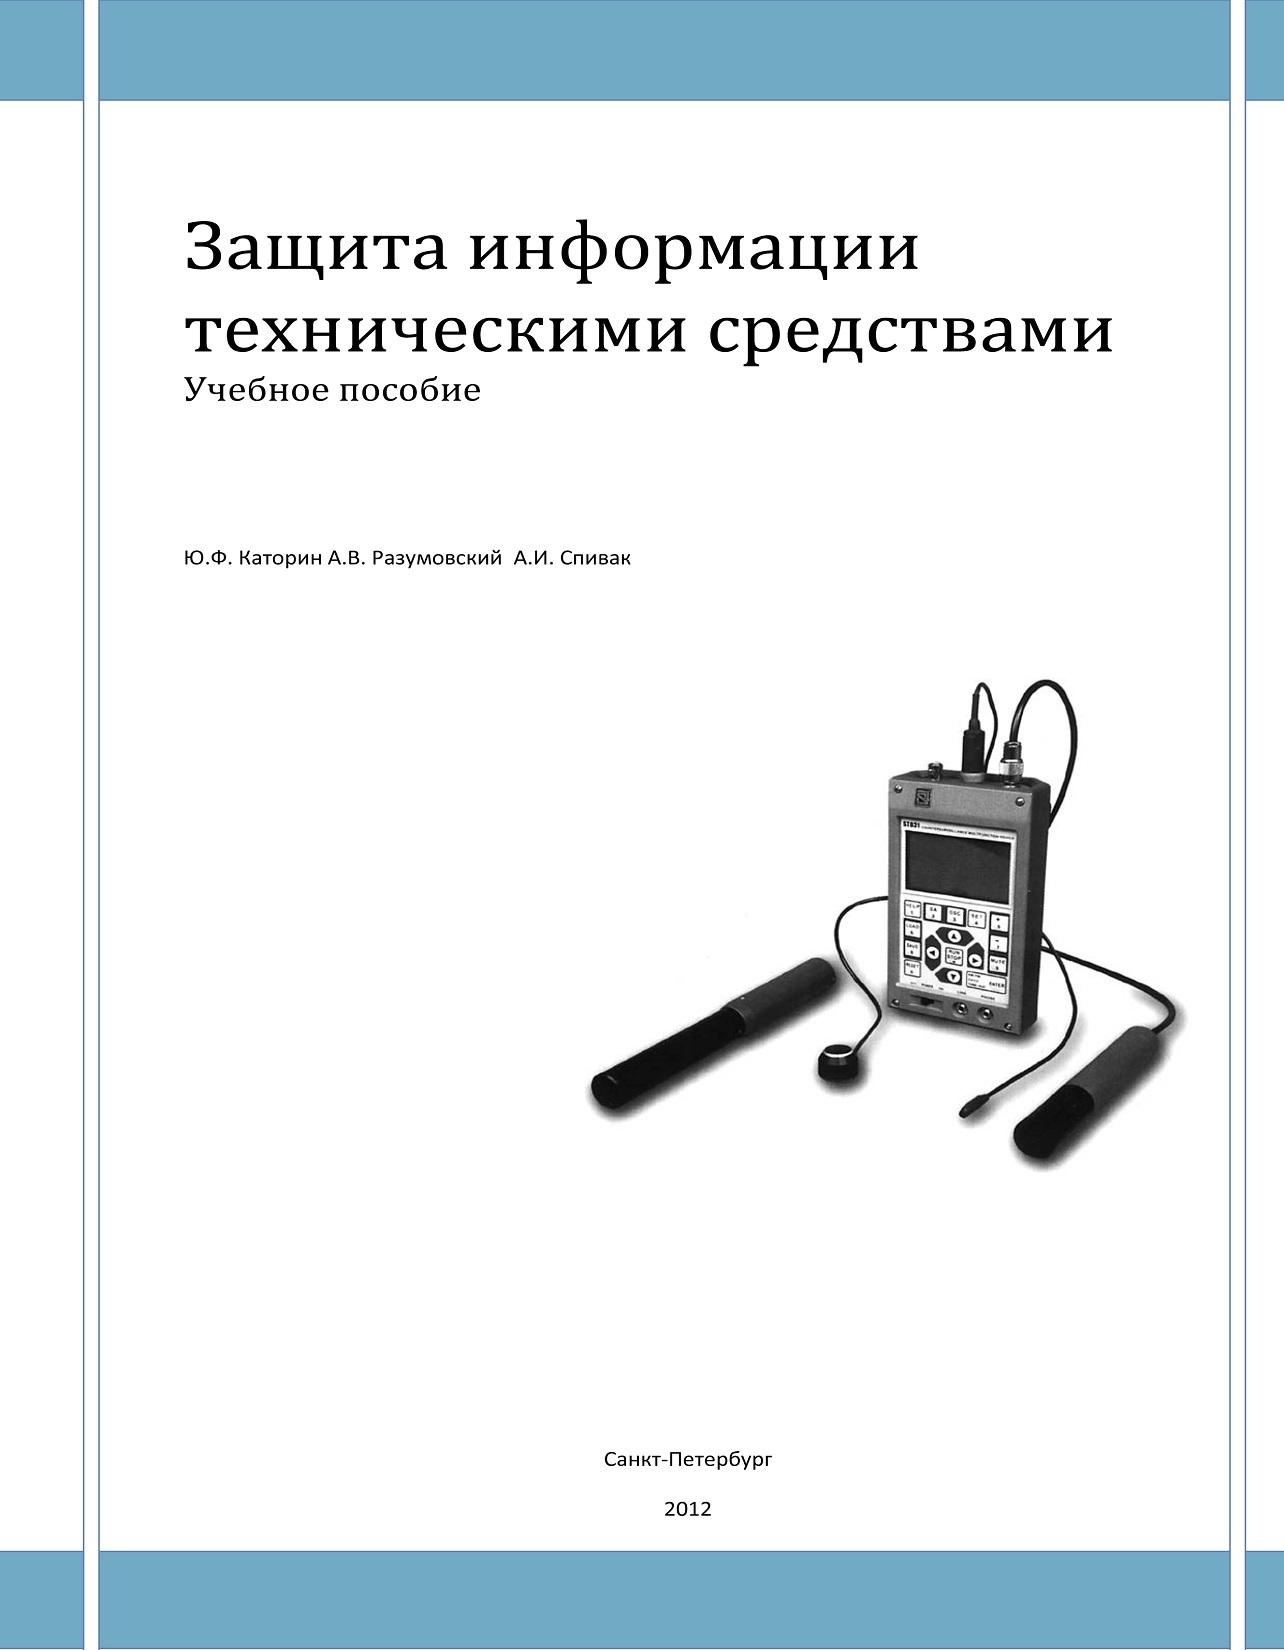 Каторин Ю. Ф. — Защита информации техническими средствами